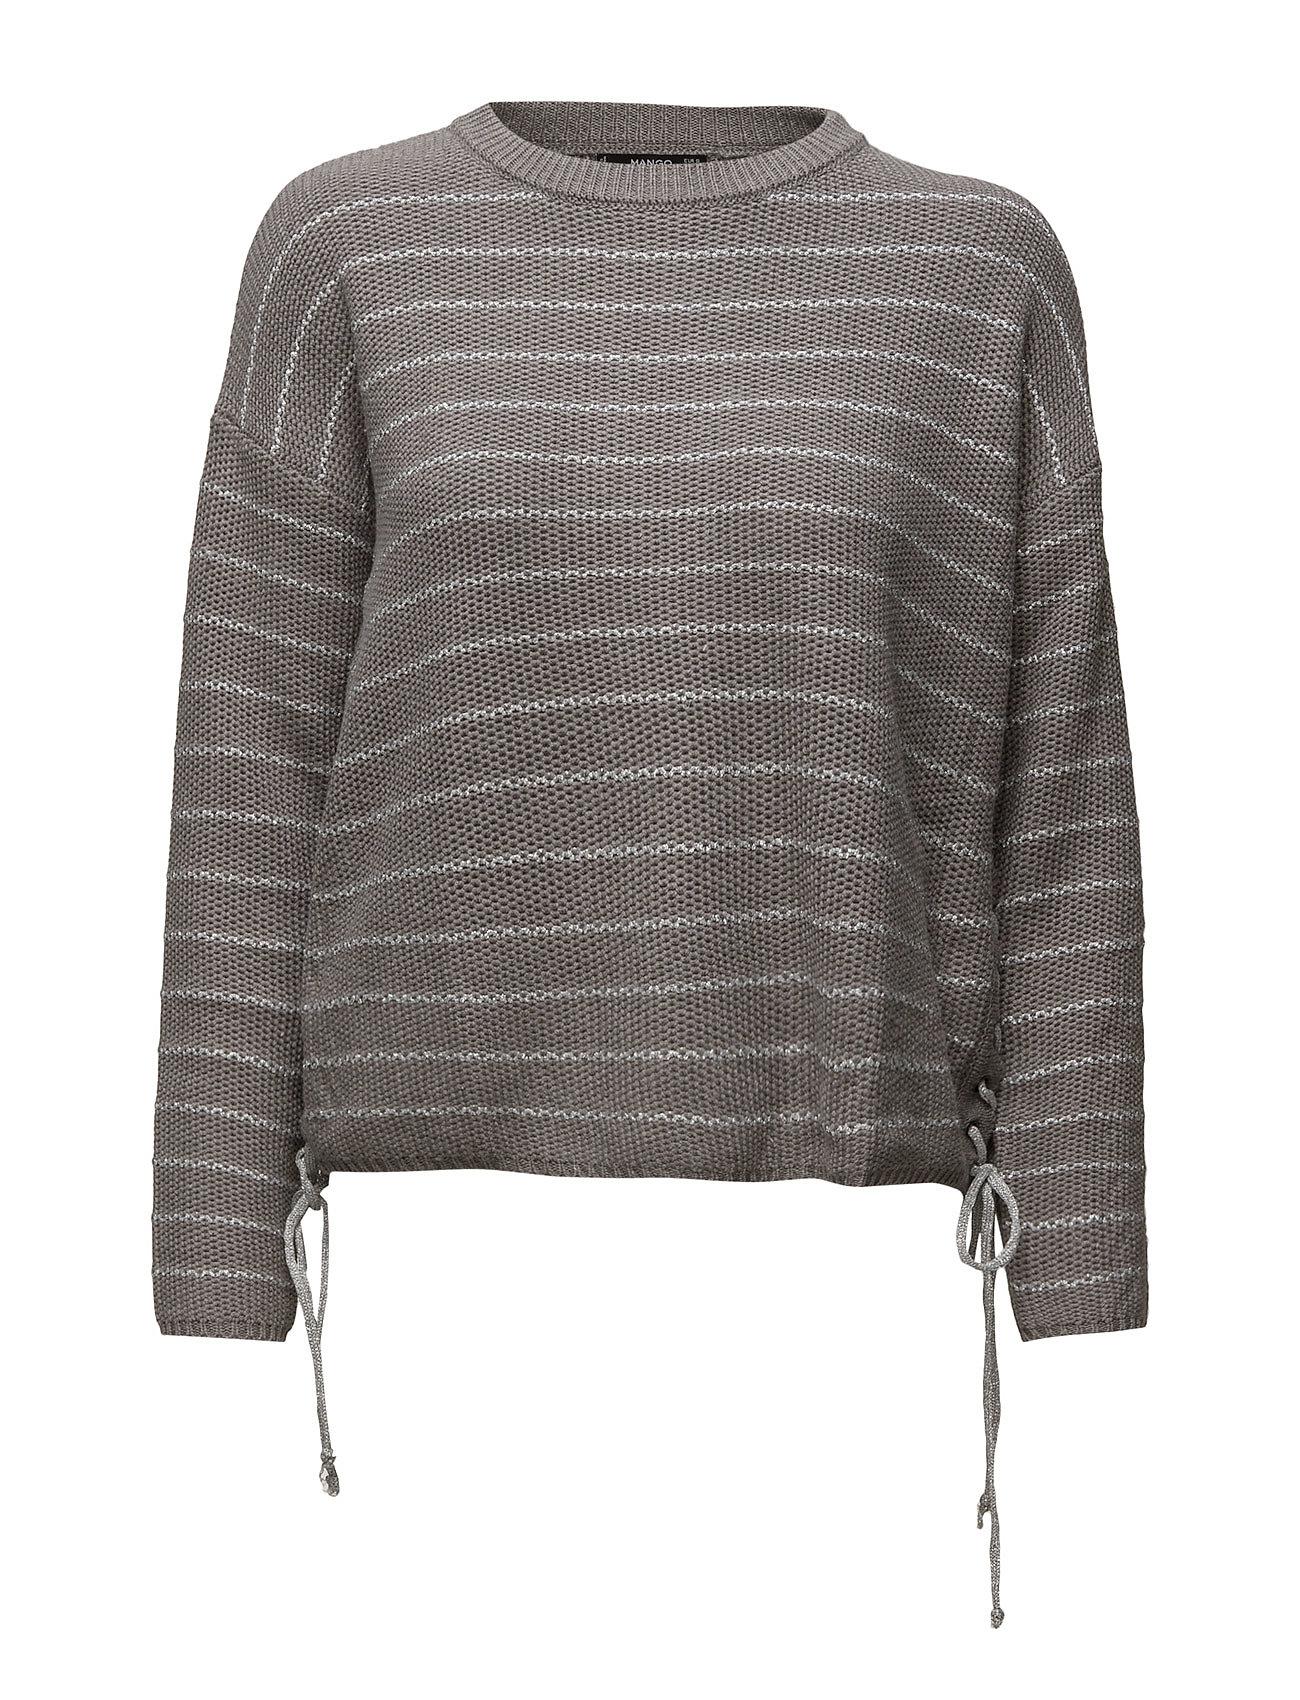 Braided Cord Sweater Mango Sweatshirts til Damer i Grå